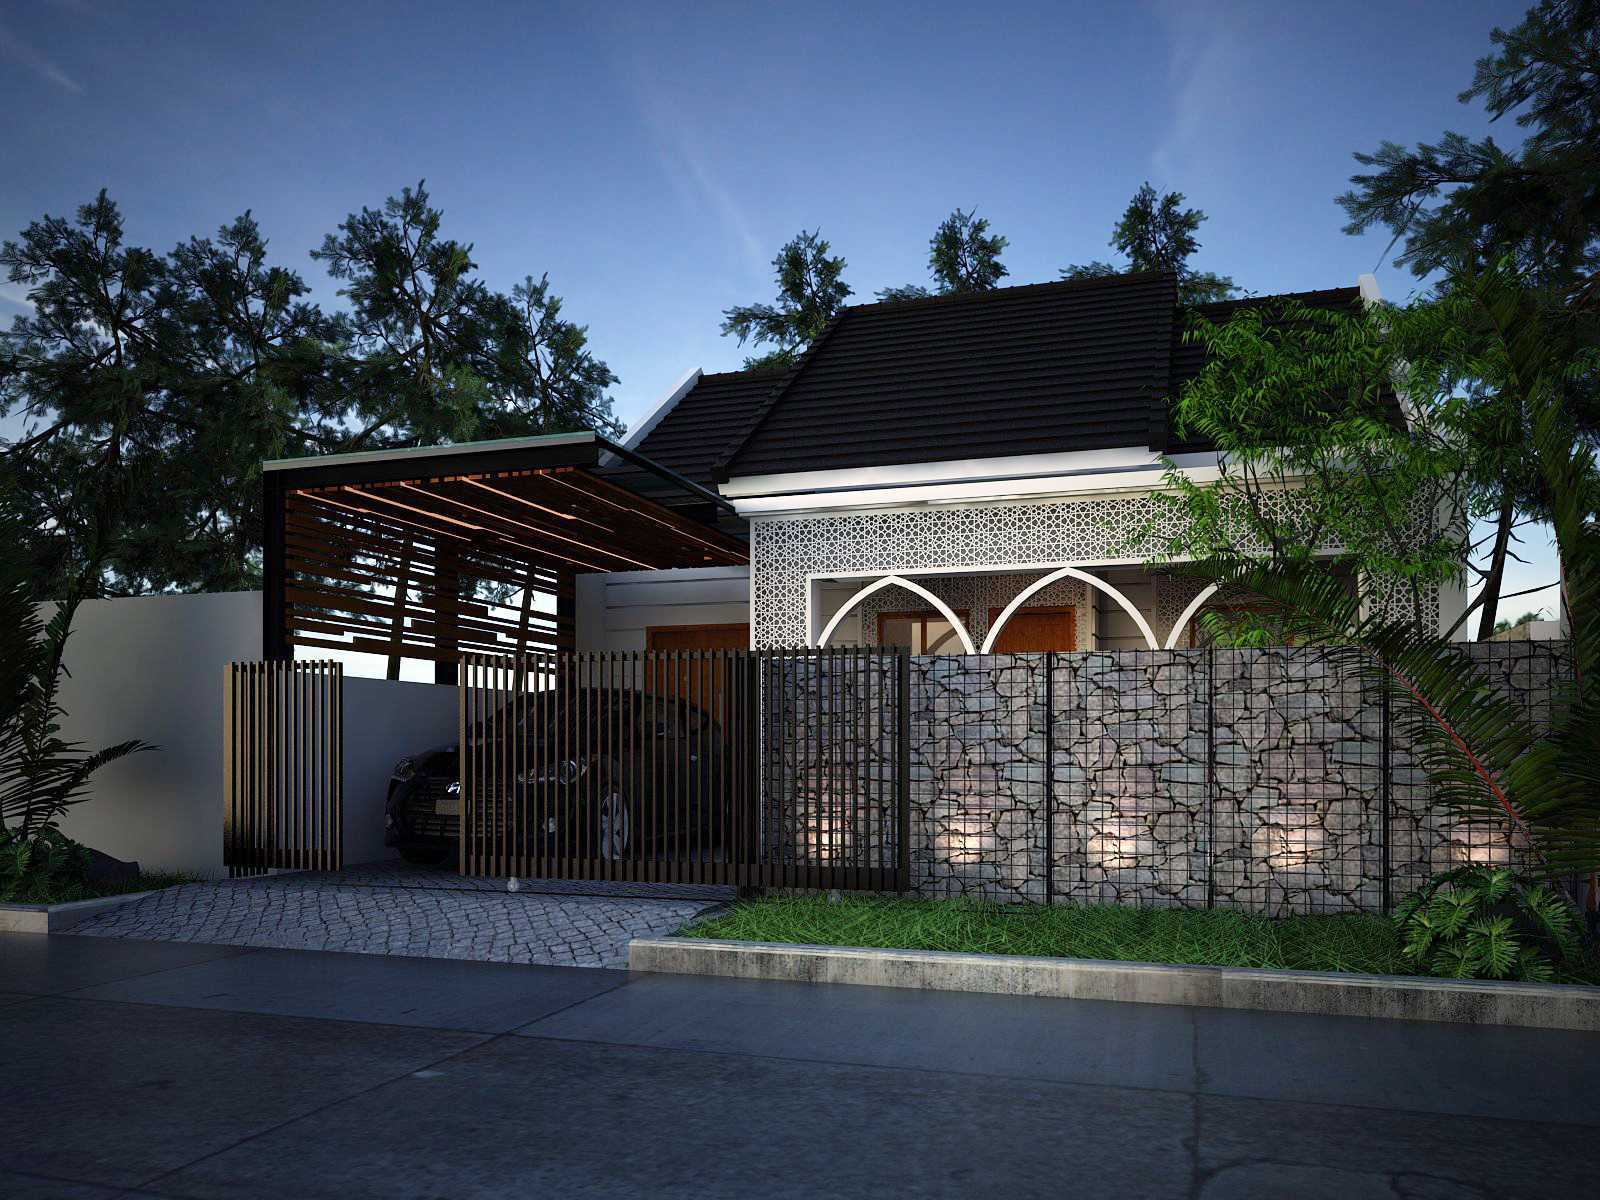 Firman Wiratama Arabian House House Manukan Kulon, Kec. Tandes, Kota Sby, Jawa Timur, Indonesia Manukan Kulon, Kec. Tandes, Kota Sby, Jawa Timur, Indonesia Firman-Wiratama-Arabian-House-House  76196